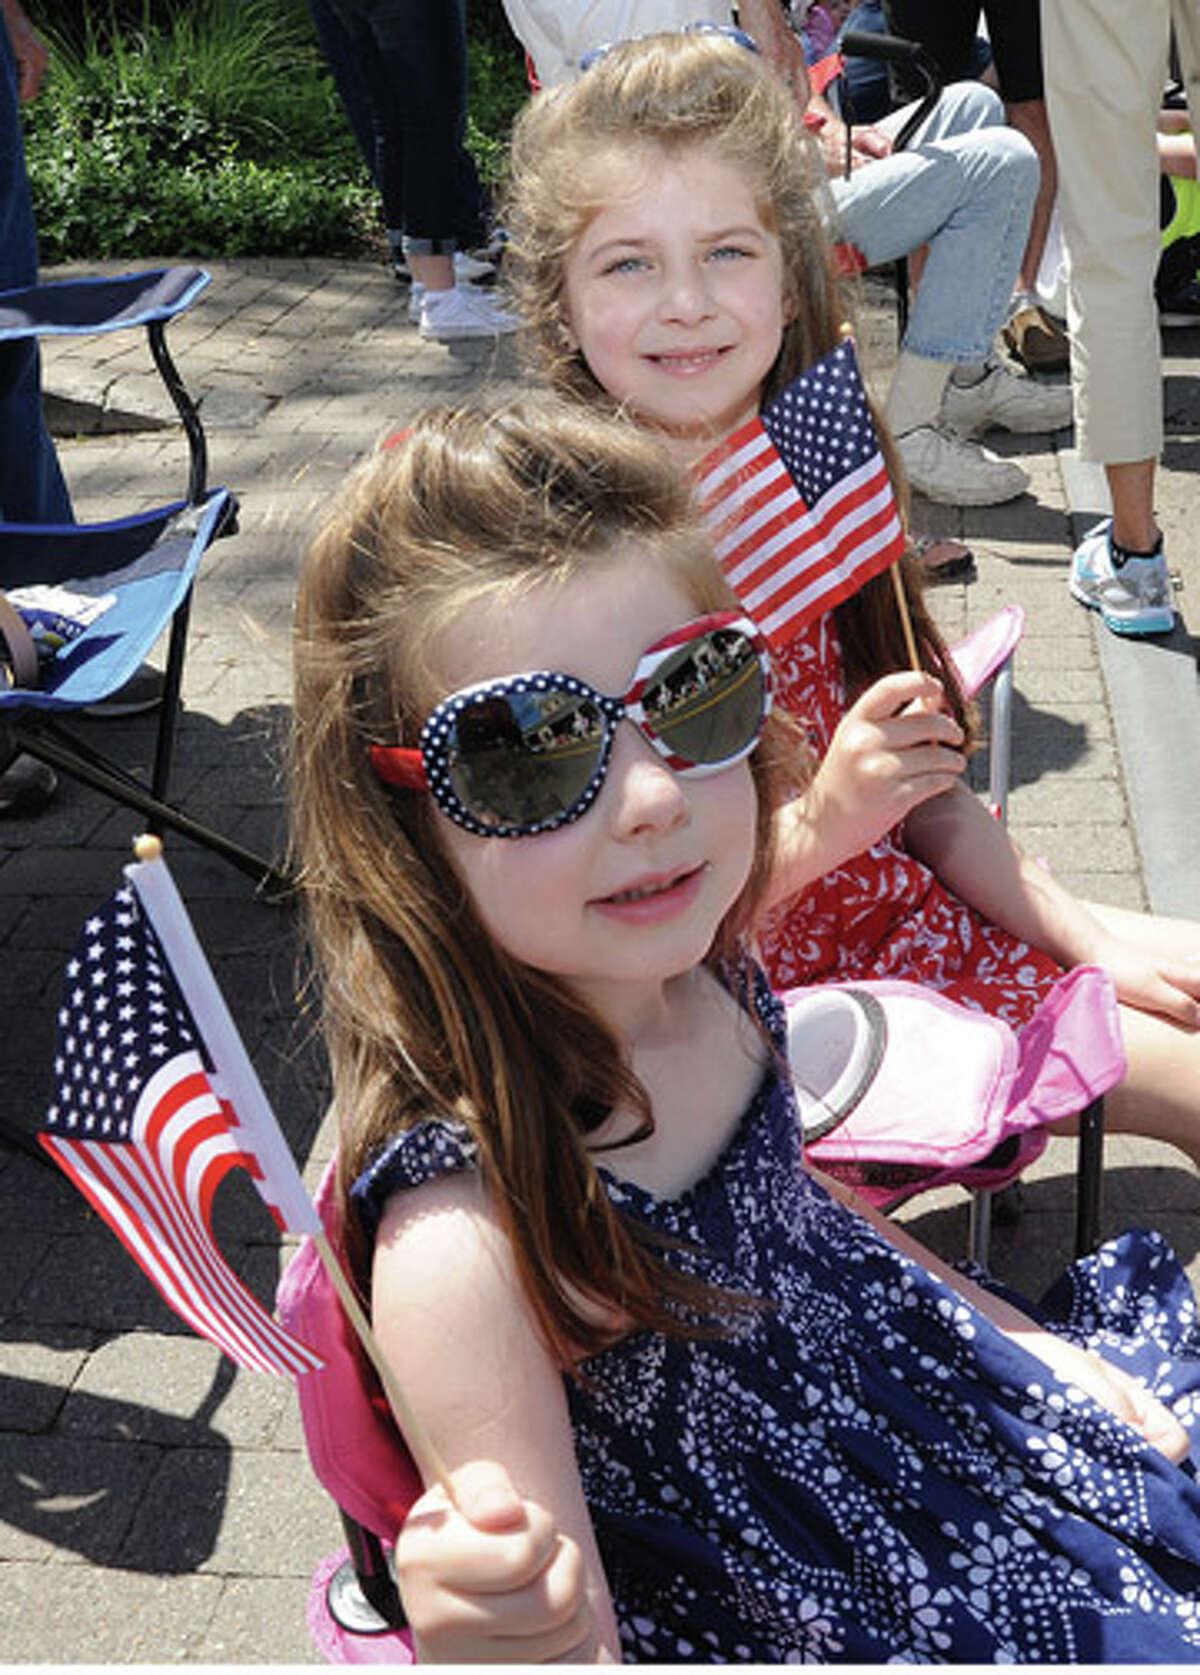 Audra 4 and her sister Alexa 6 Sunday at the Rowayton Memorial Day Parade. Hour photo/Matthew Vinci